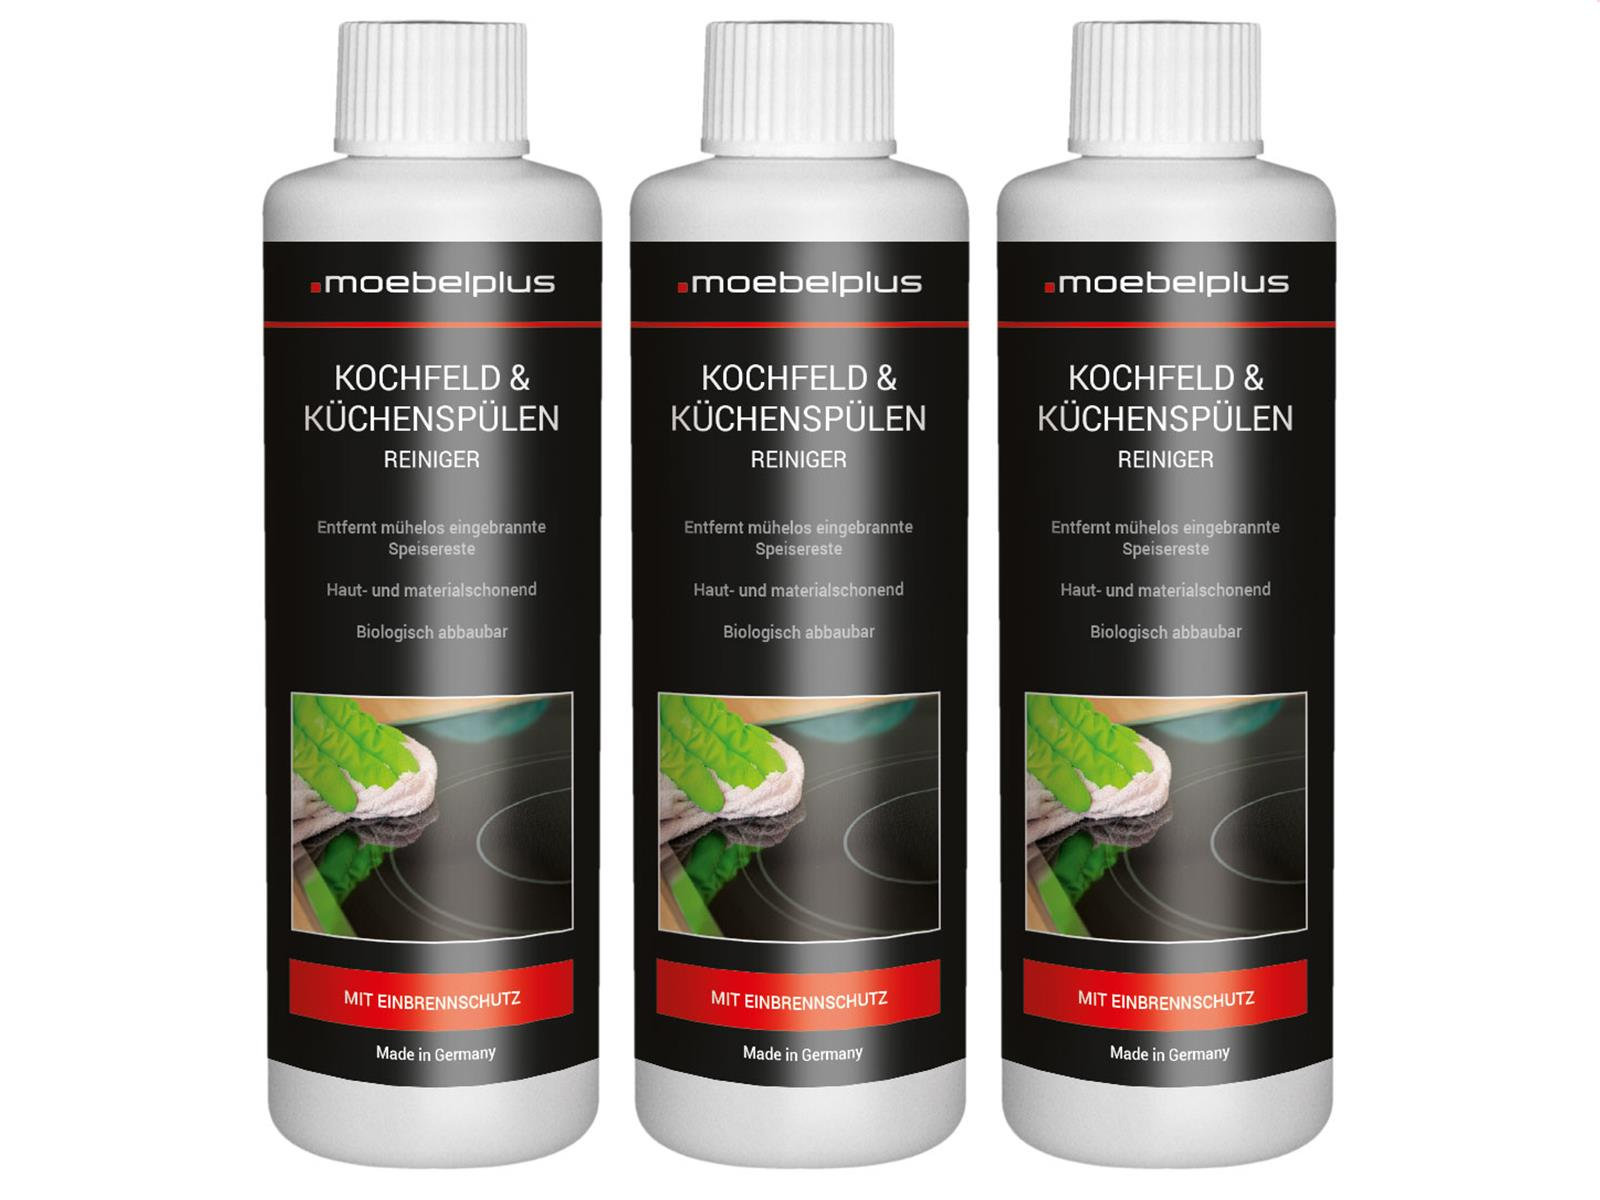 moebelplus Kochfeld & Küchenspülen Reiniger - 3er Set